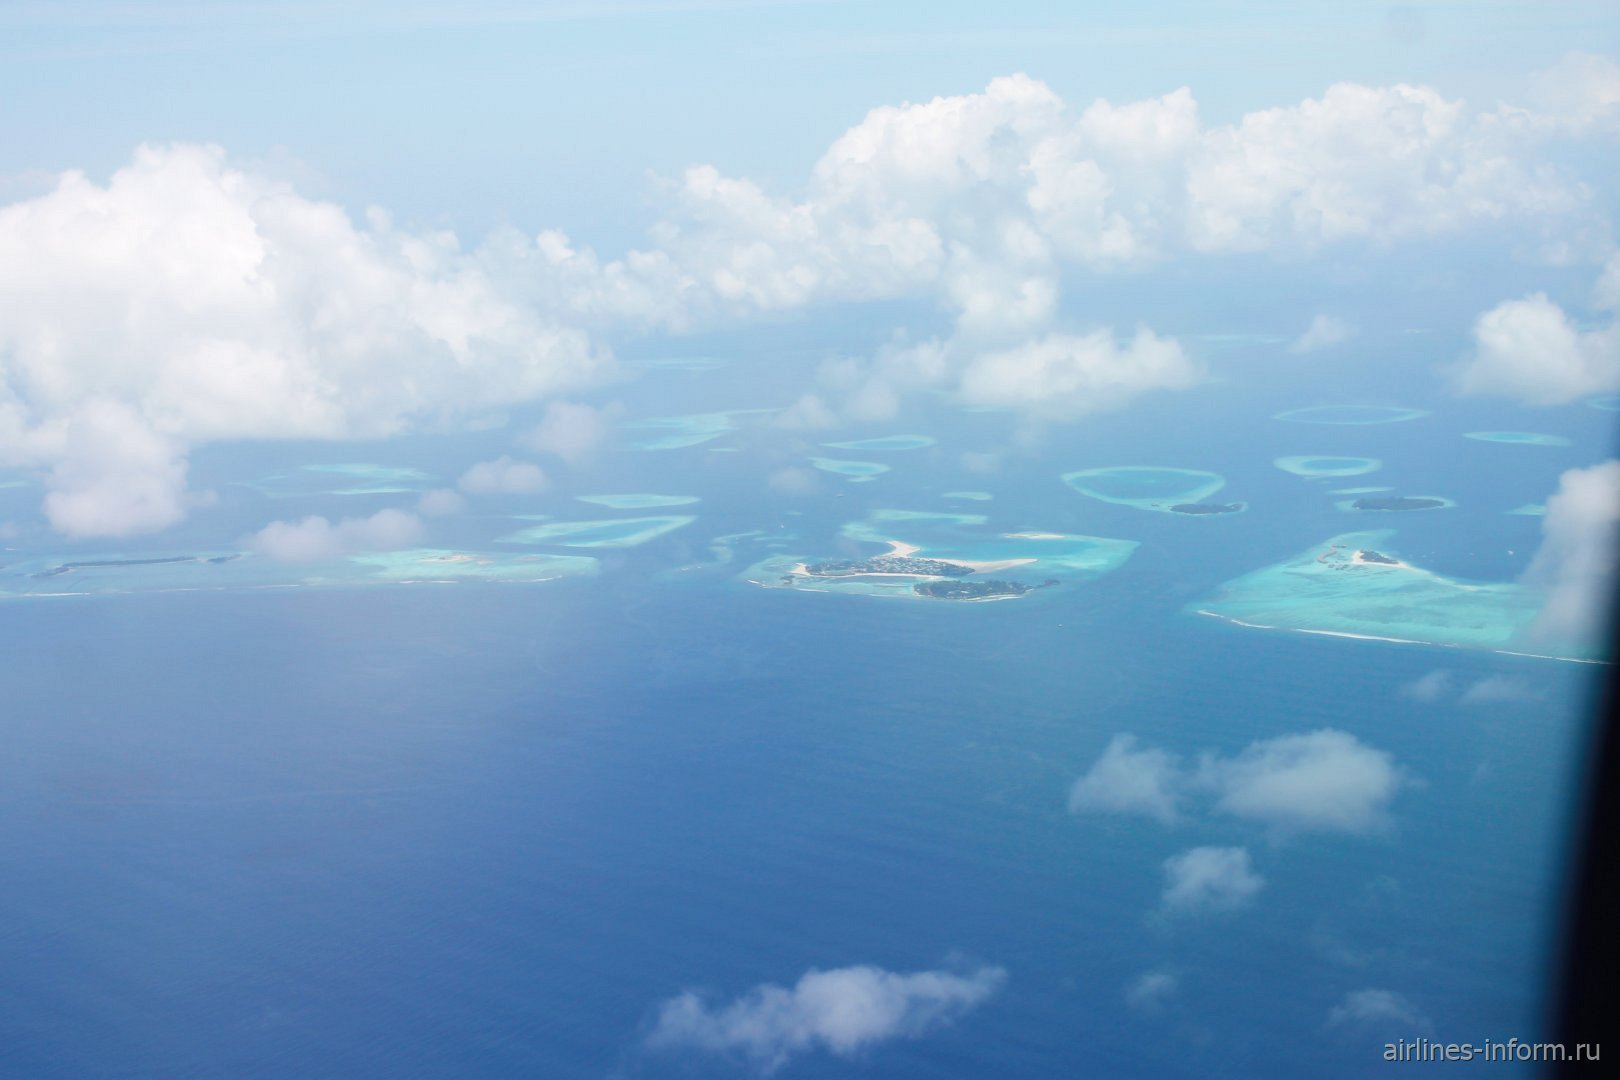 Атоллы Мальдивского архипелага